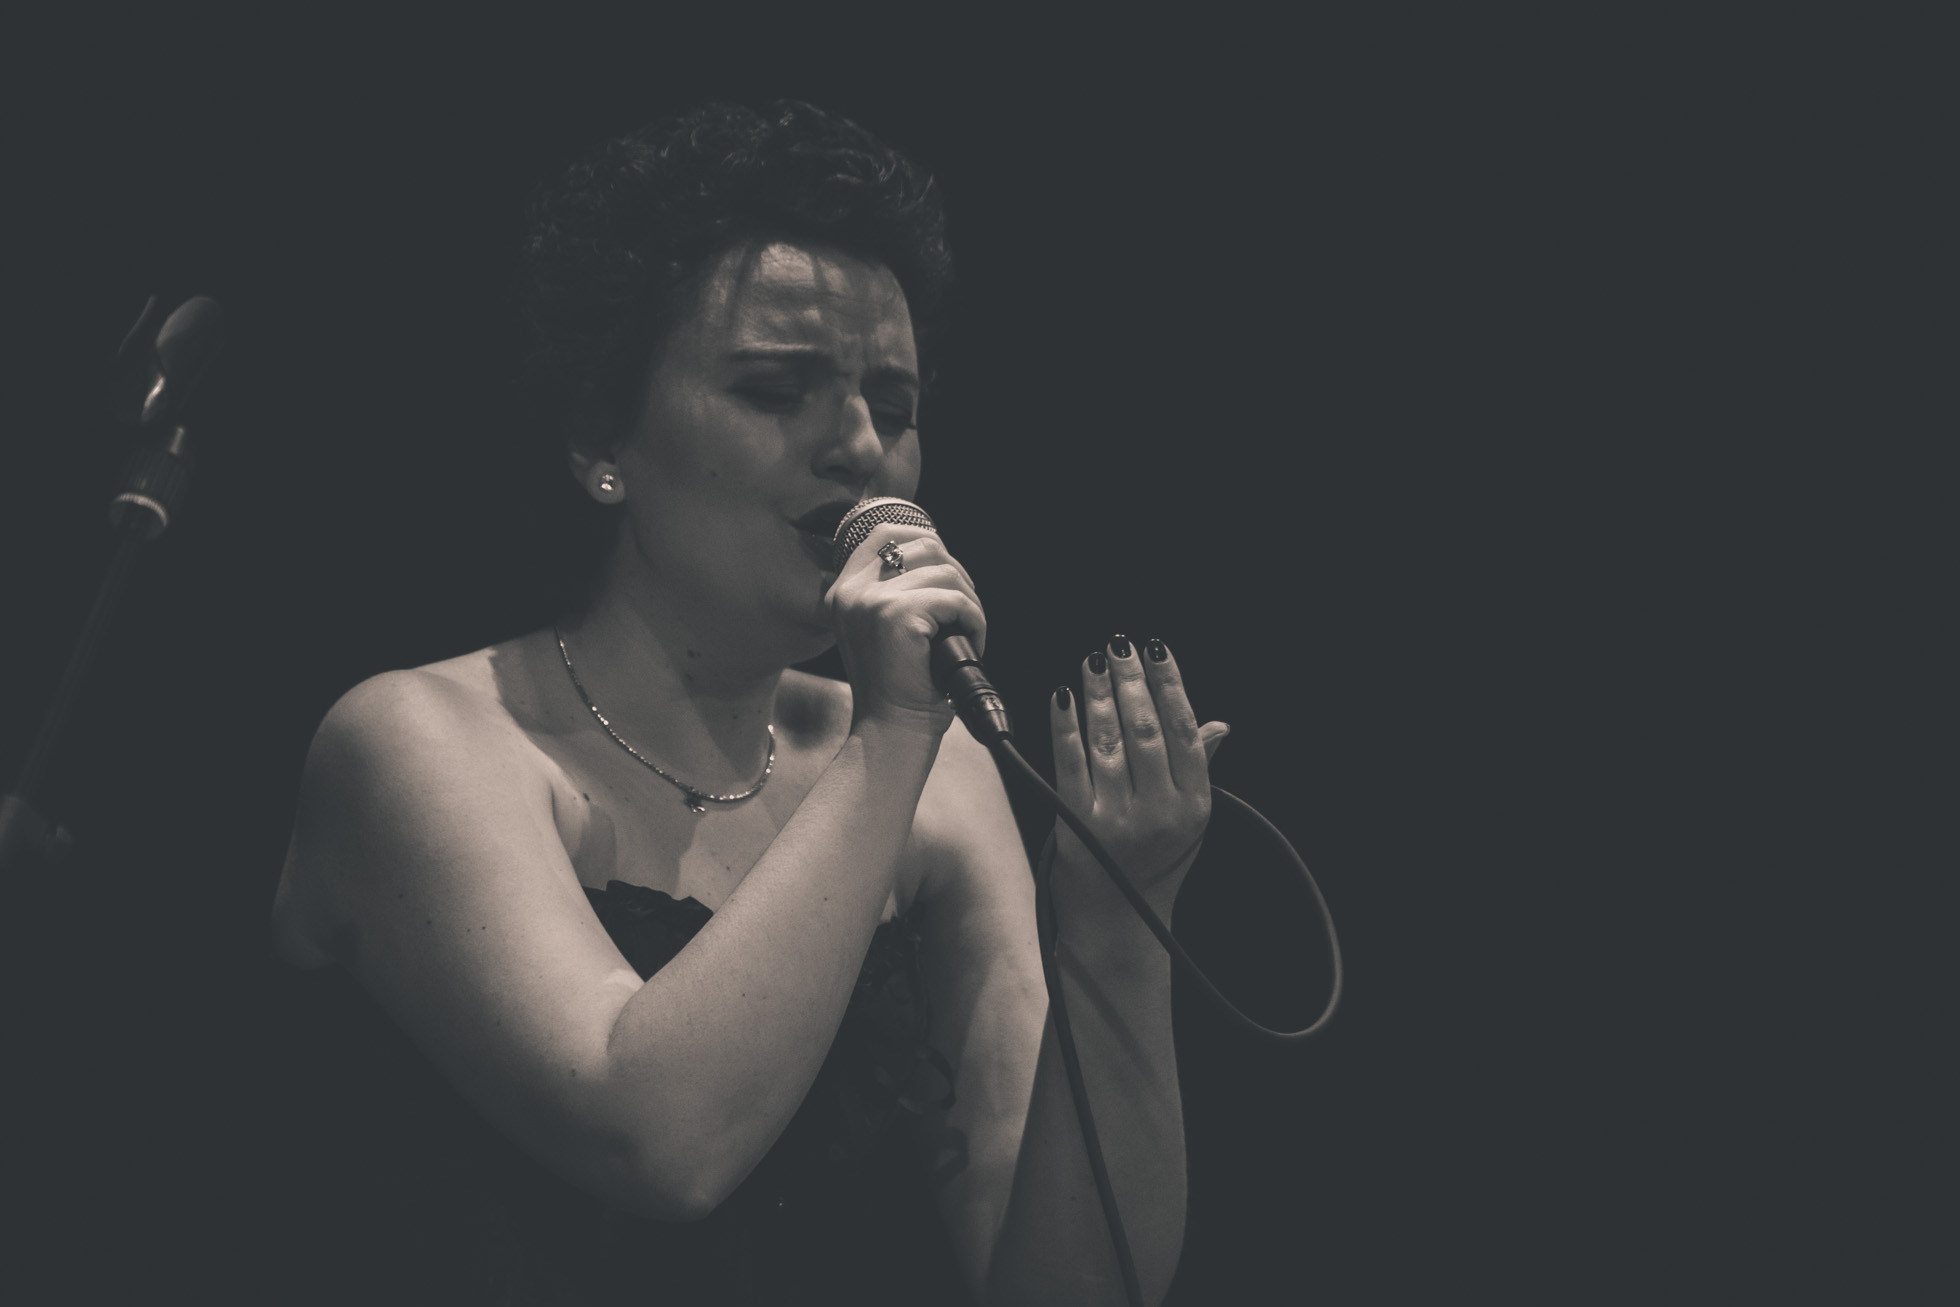 Zrinka Posavec. Izvor: http://zrinkaposavec.com/wp-content/uploads/2014/10/IMG_9731.jpg